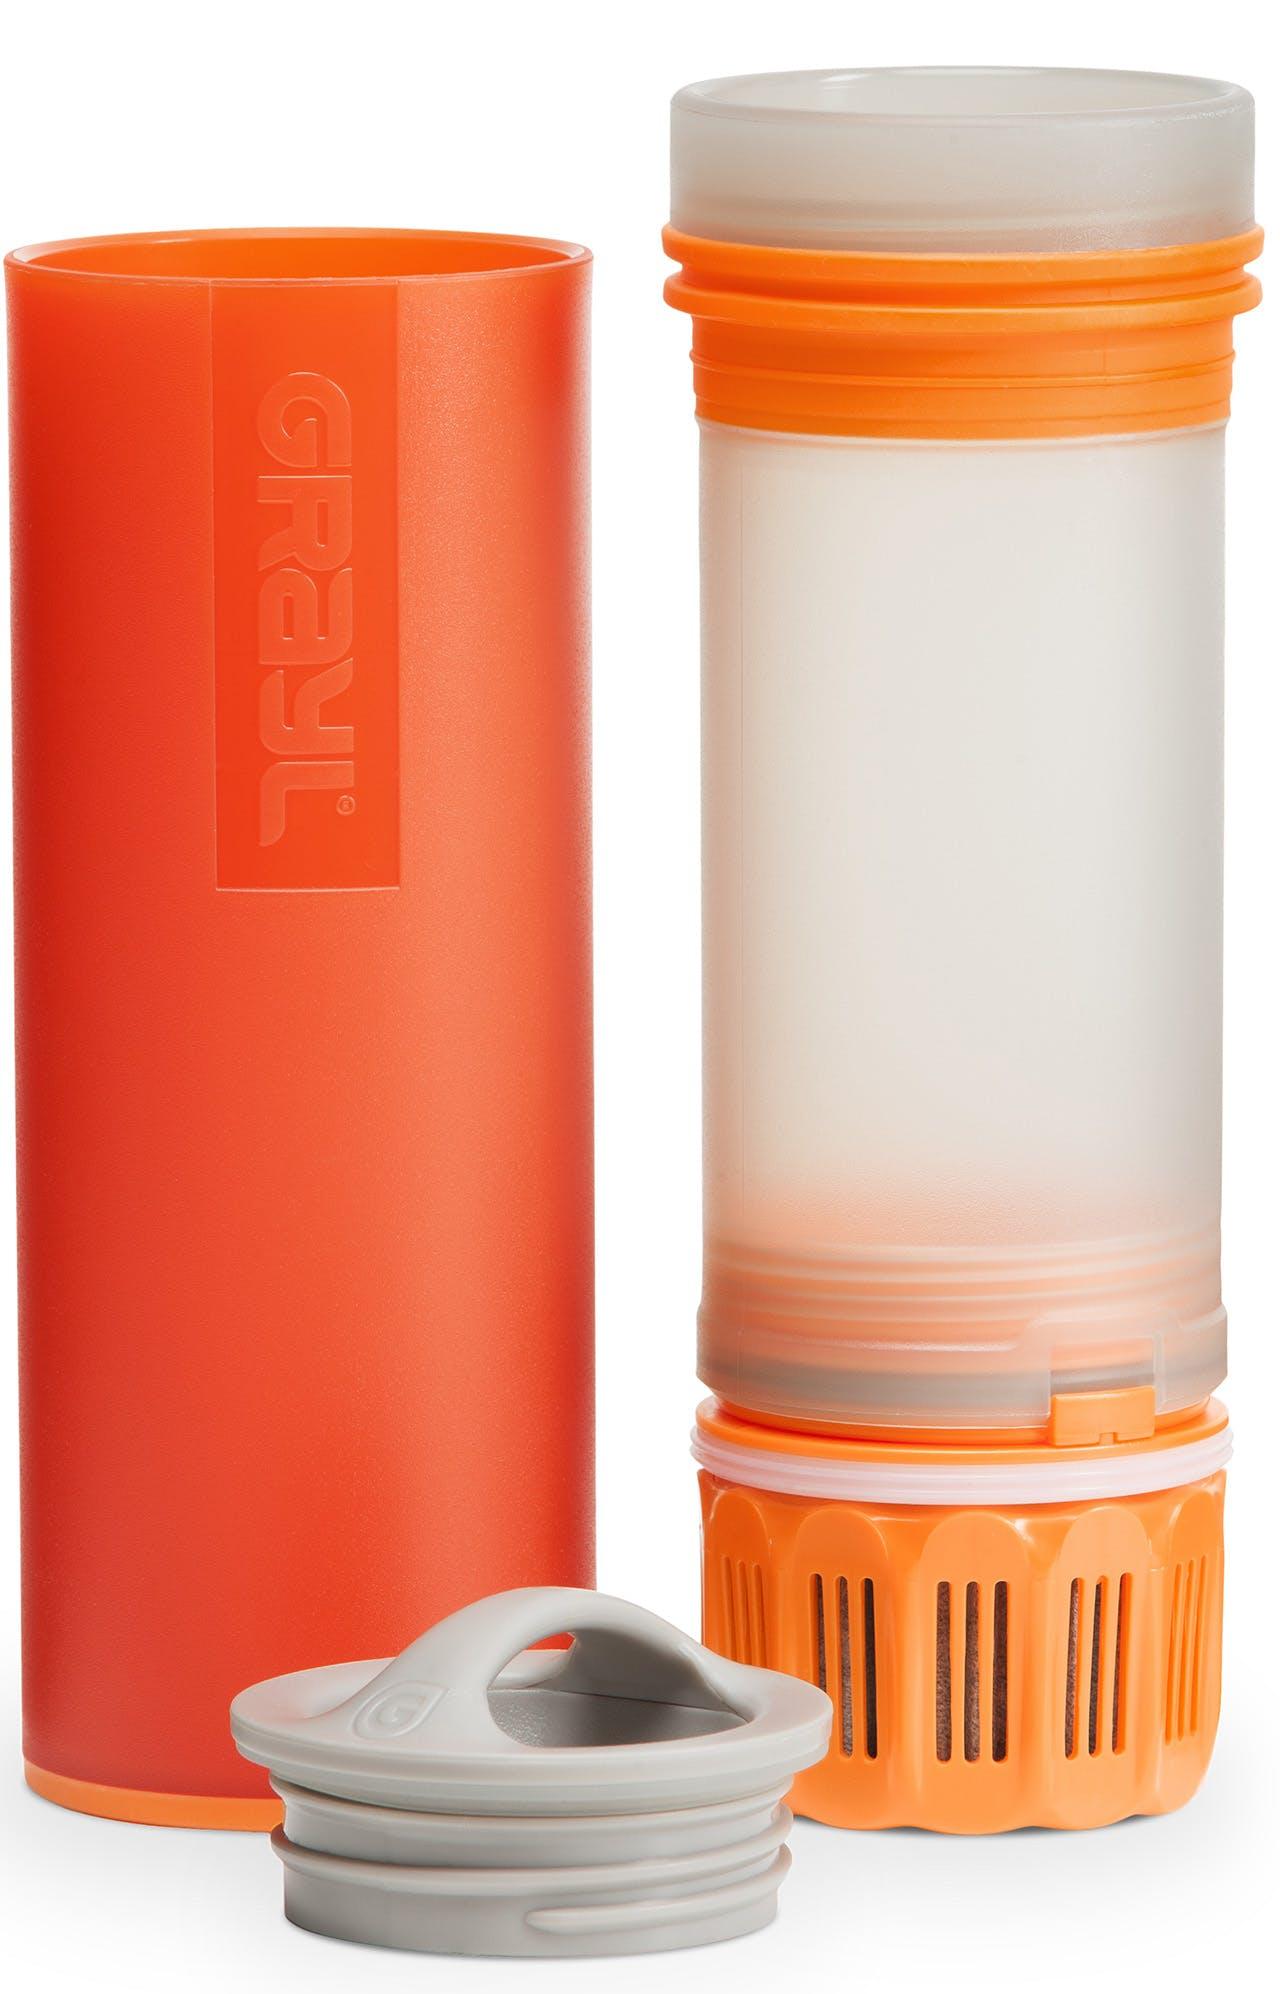 The GRAYL Ultralight Purifier Bottle